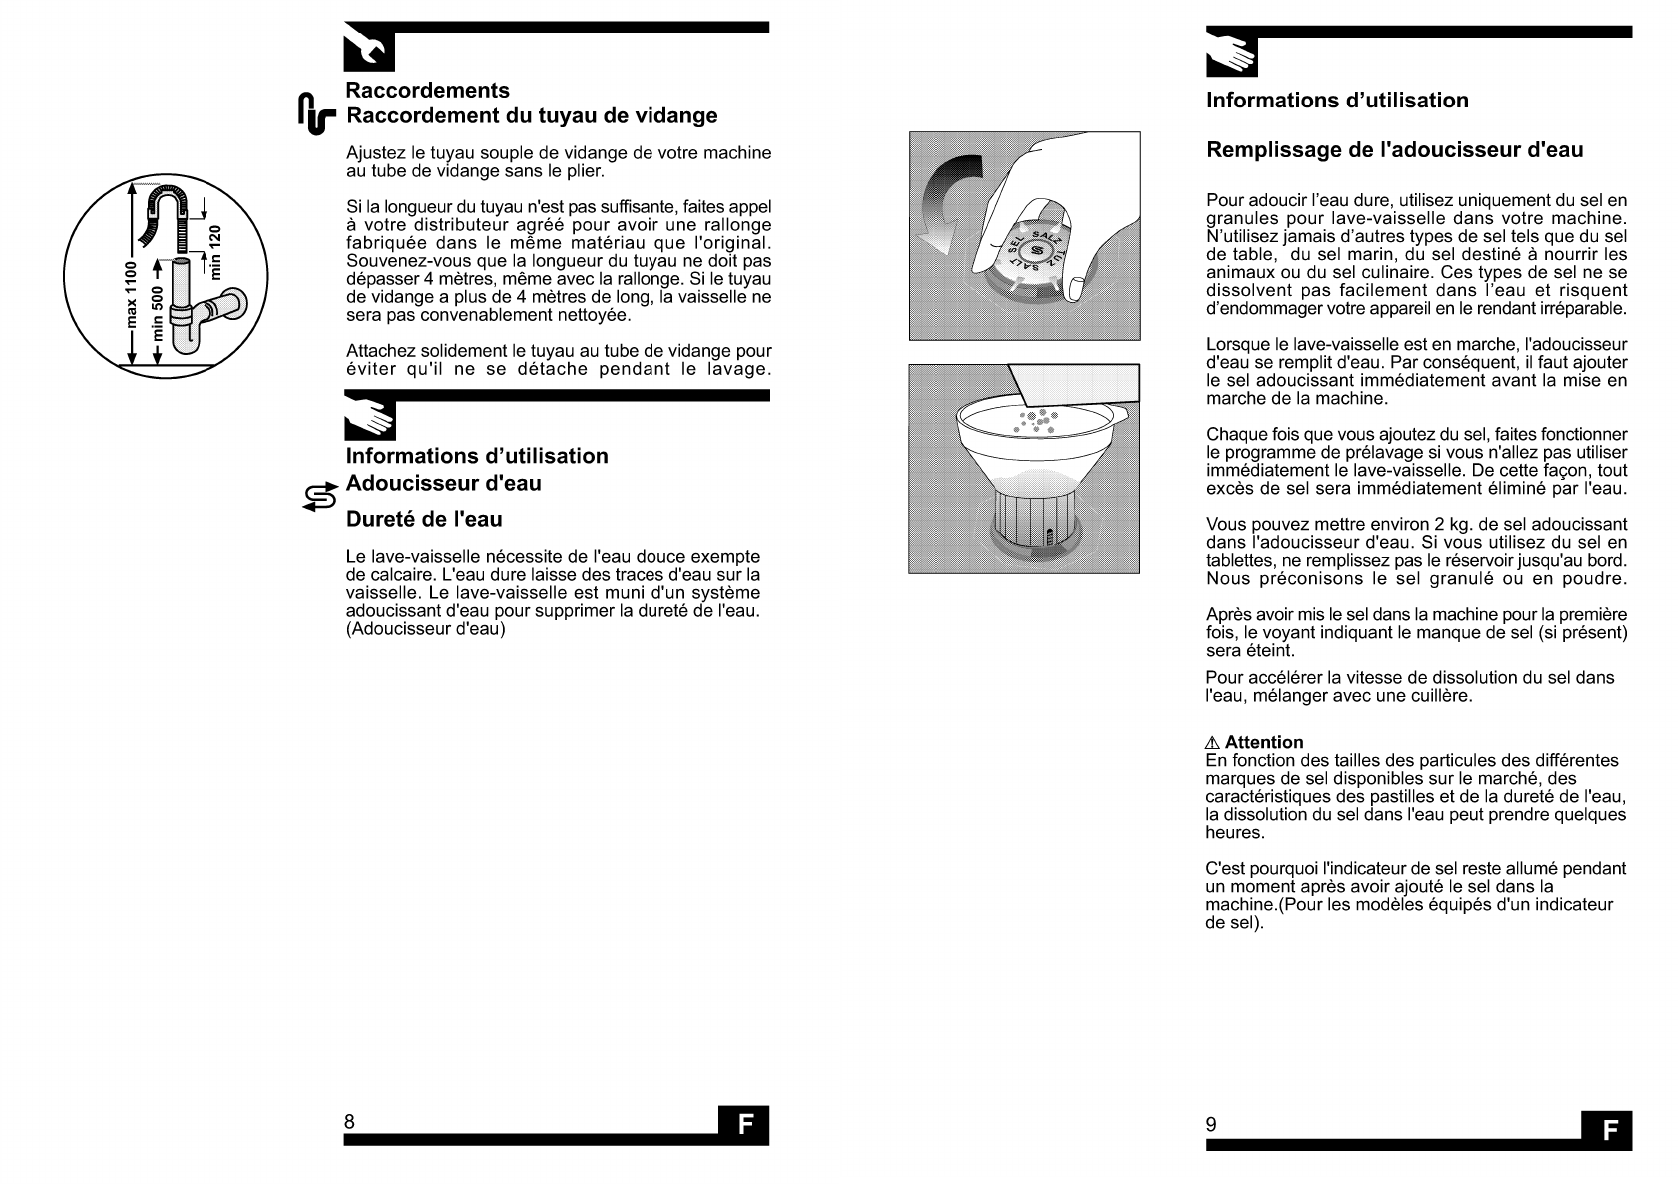 Handleiding Beko D 8879 Fd Pagina 11 Van 12 Francais